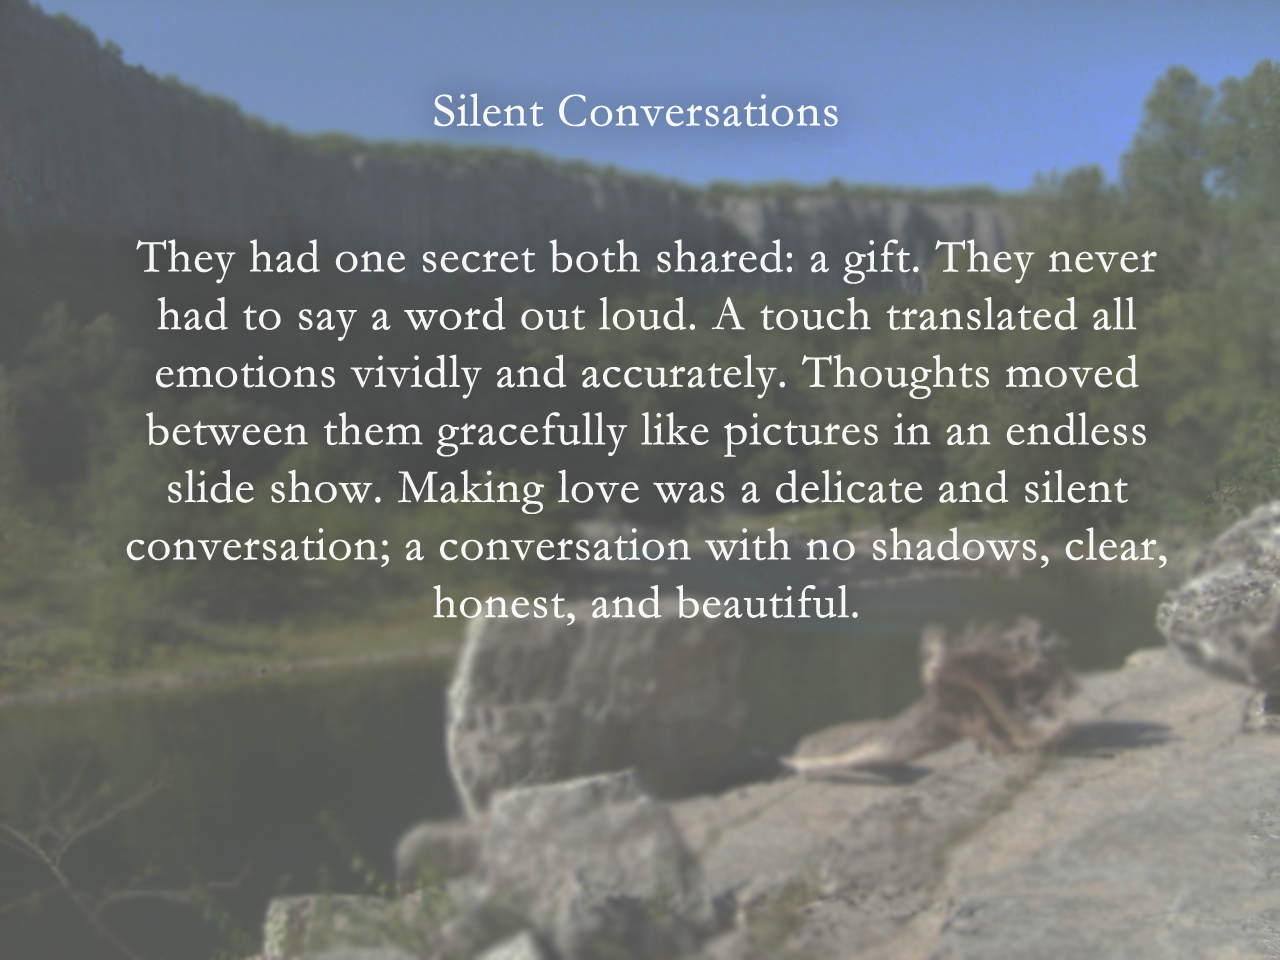 Silent-Conversations-2